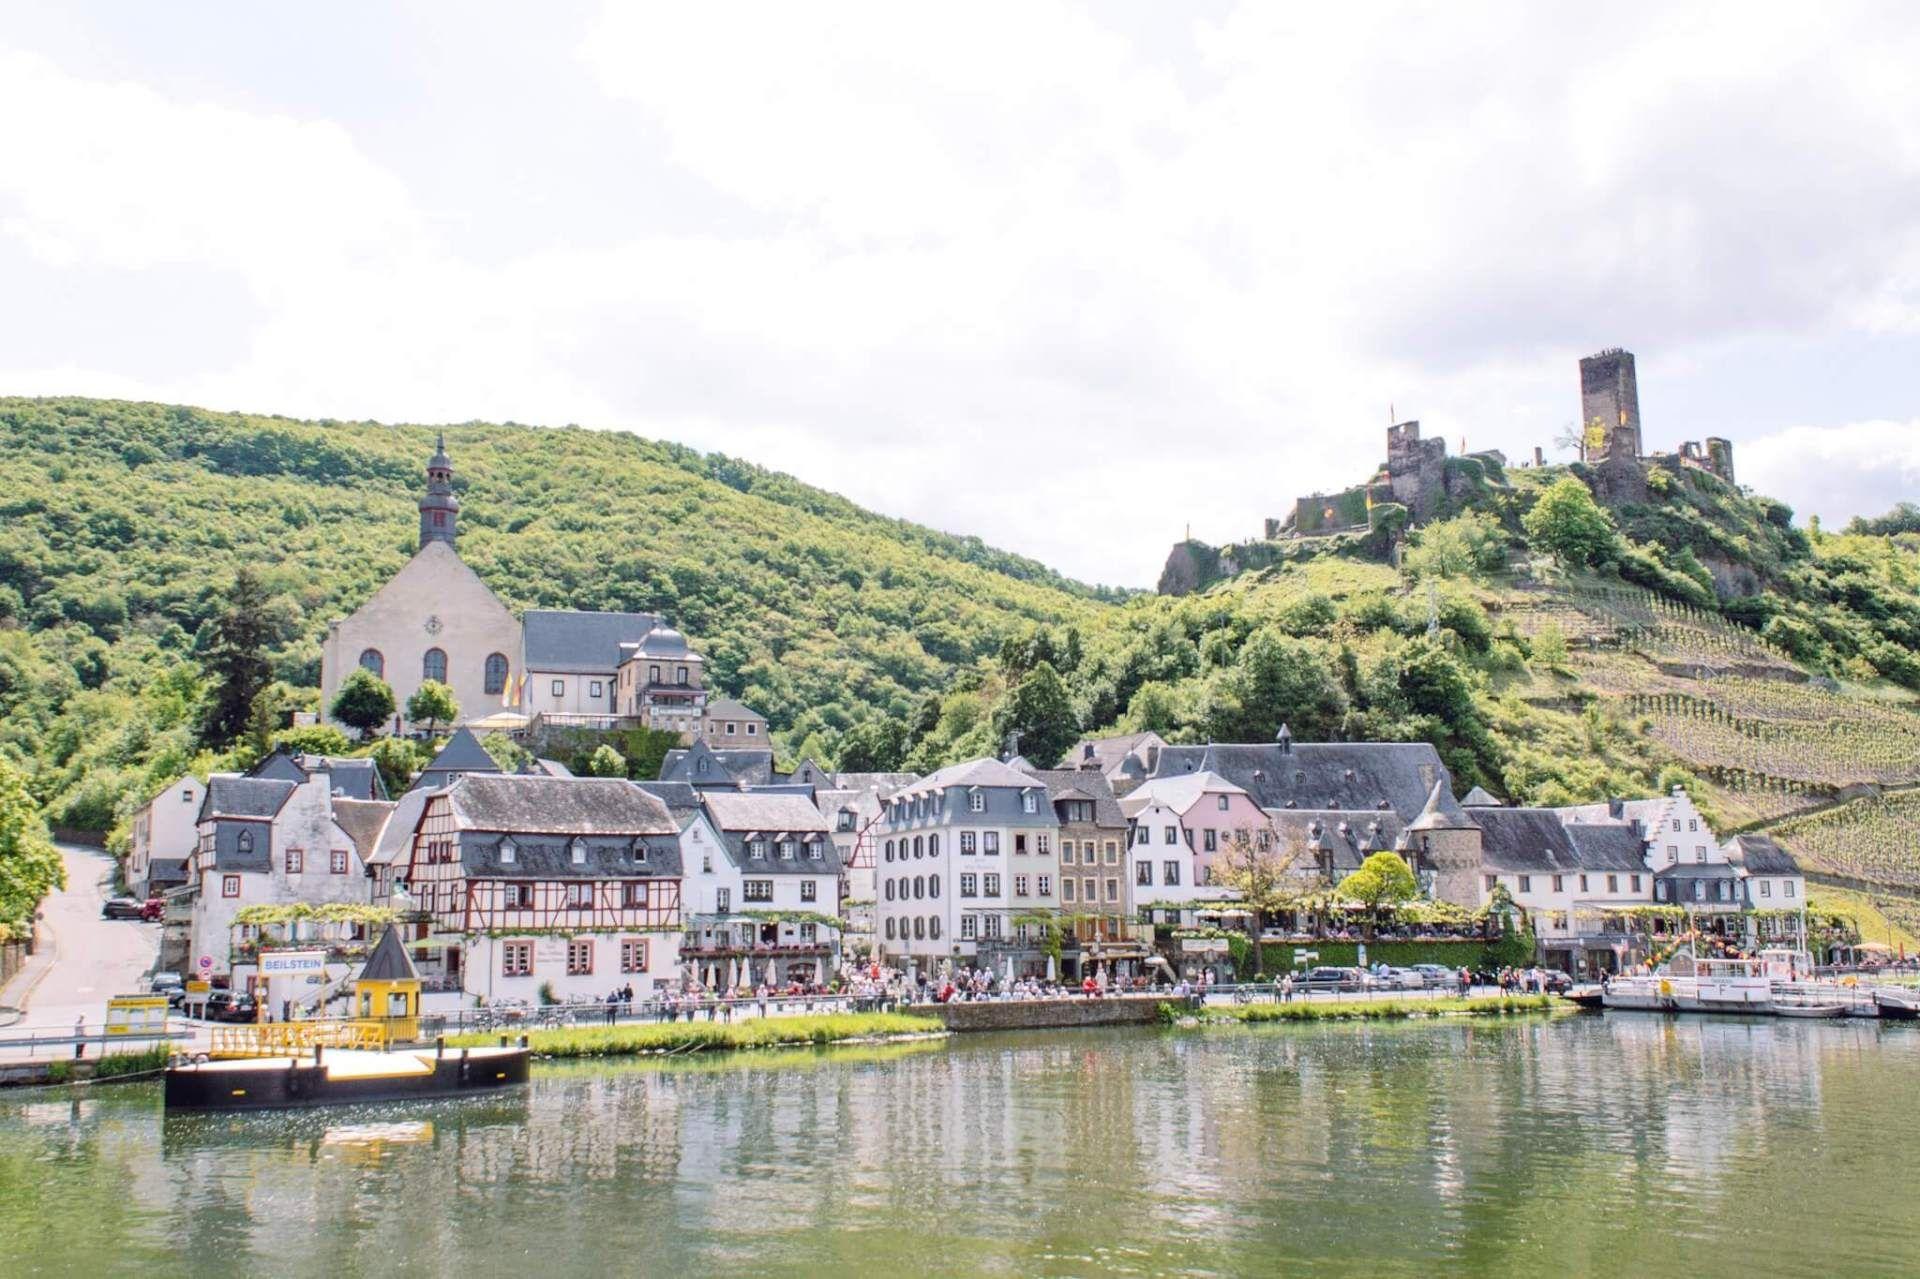 Day trip to Beilstein Germany - Skylar Aria's Adventures | Germany travel  destinations, Germany destinations, Nightlife travel